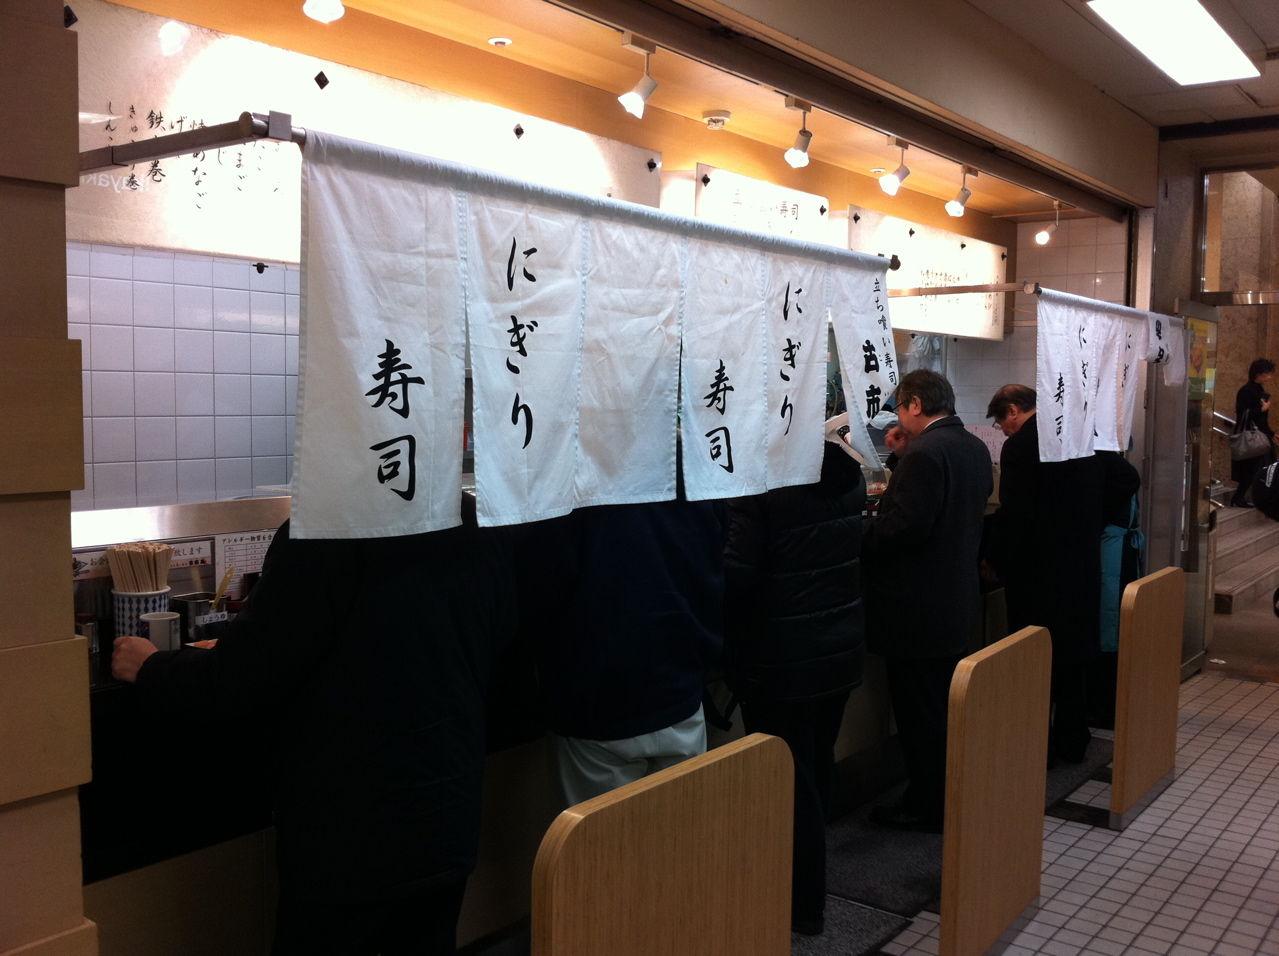 立ち食い寿司「古市庵」@阪神百貨店梅田本店B1